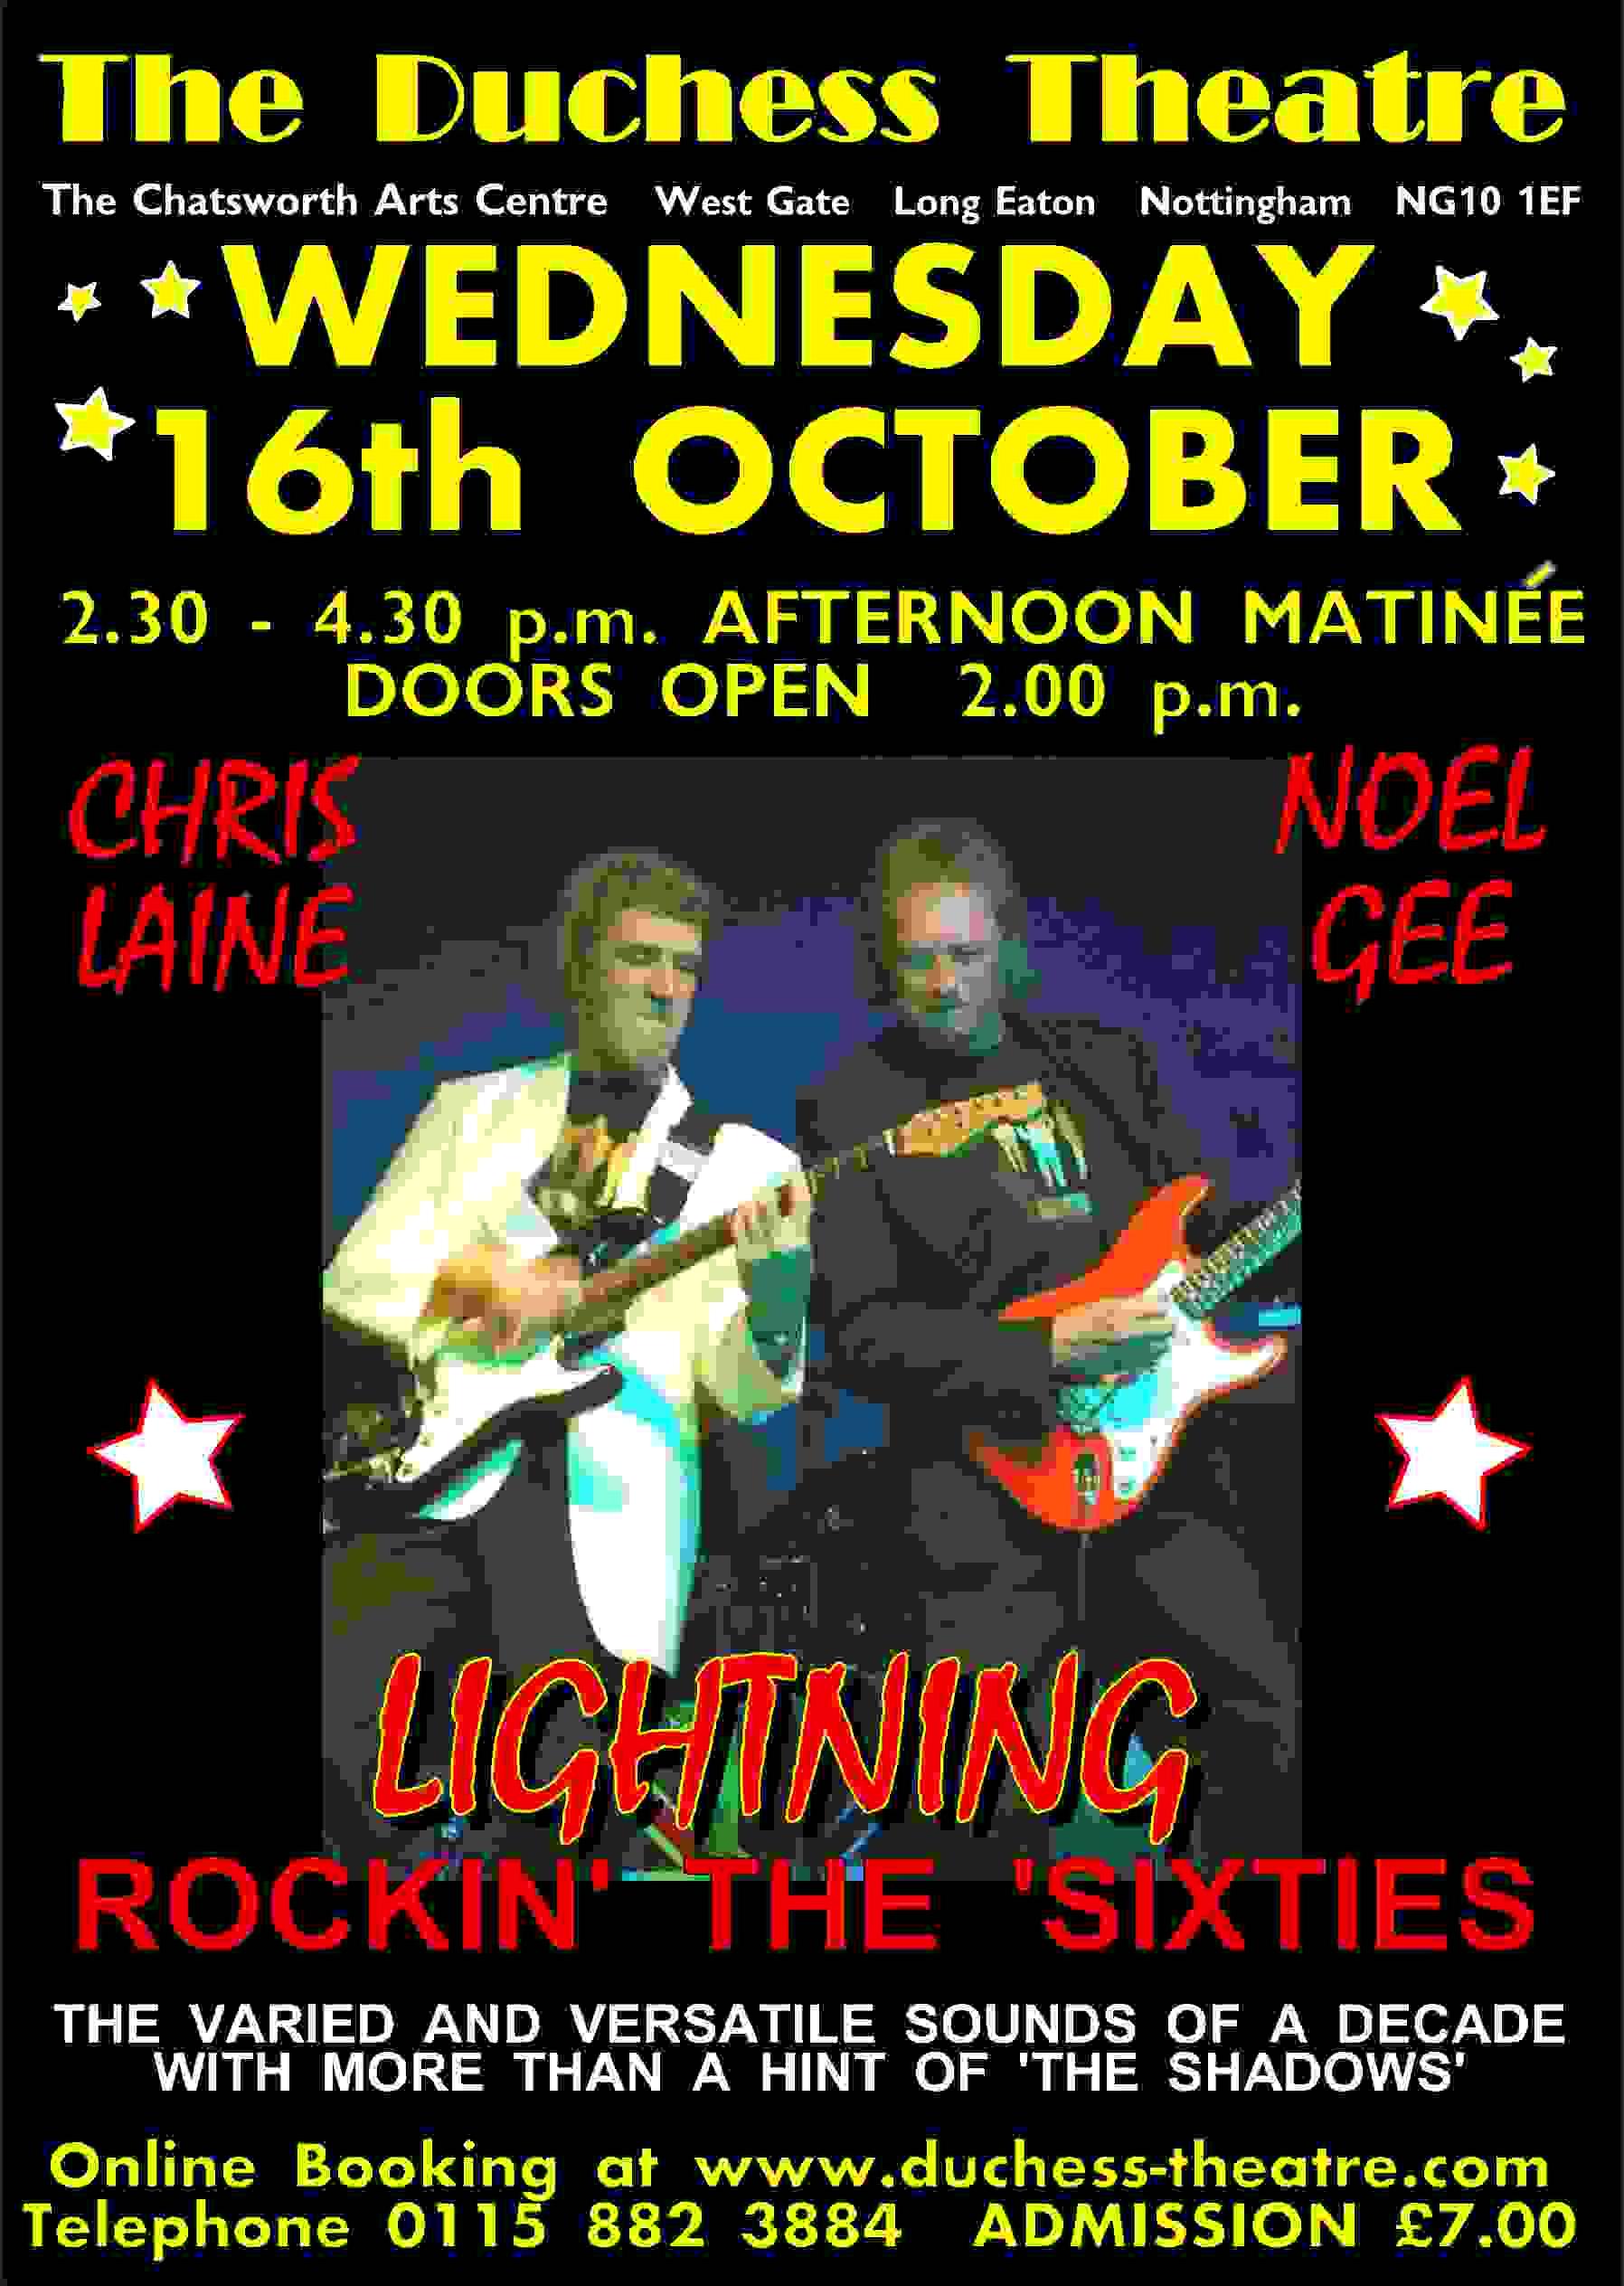 LIGHTNING Rockin' the 60's - Noel Gee Presents banner image